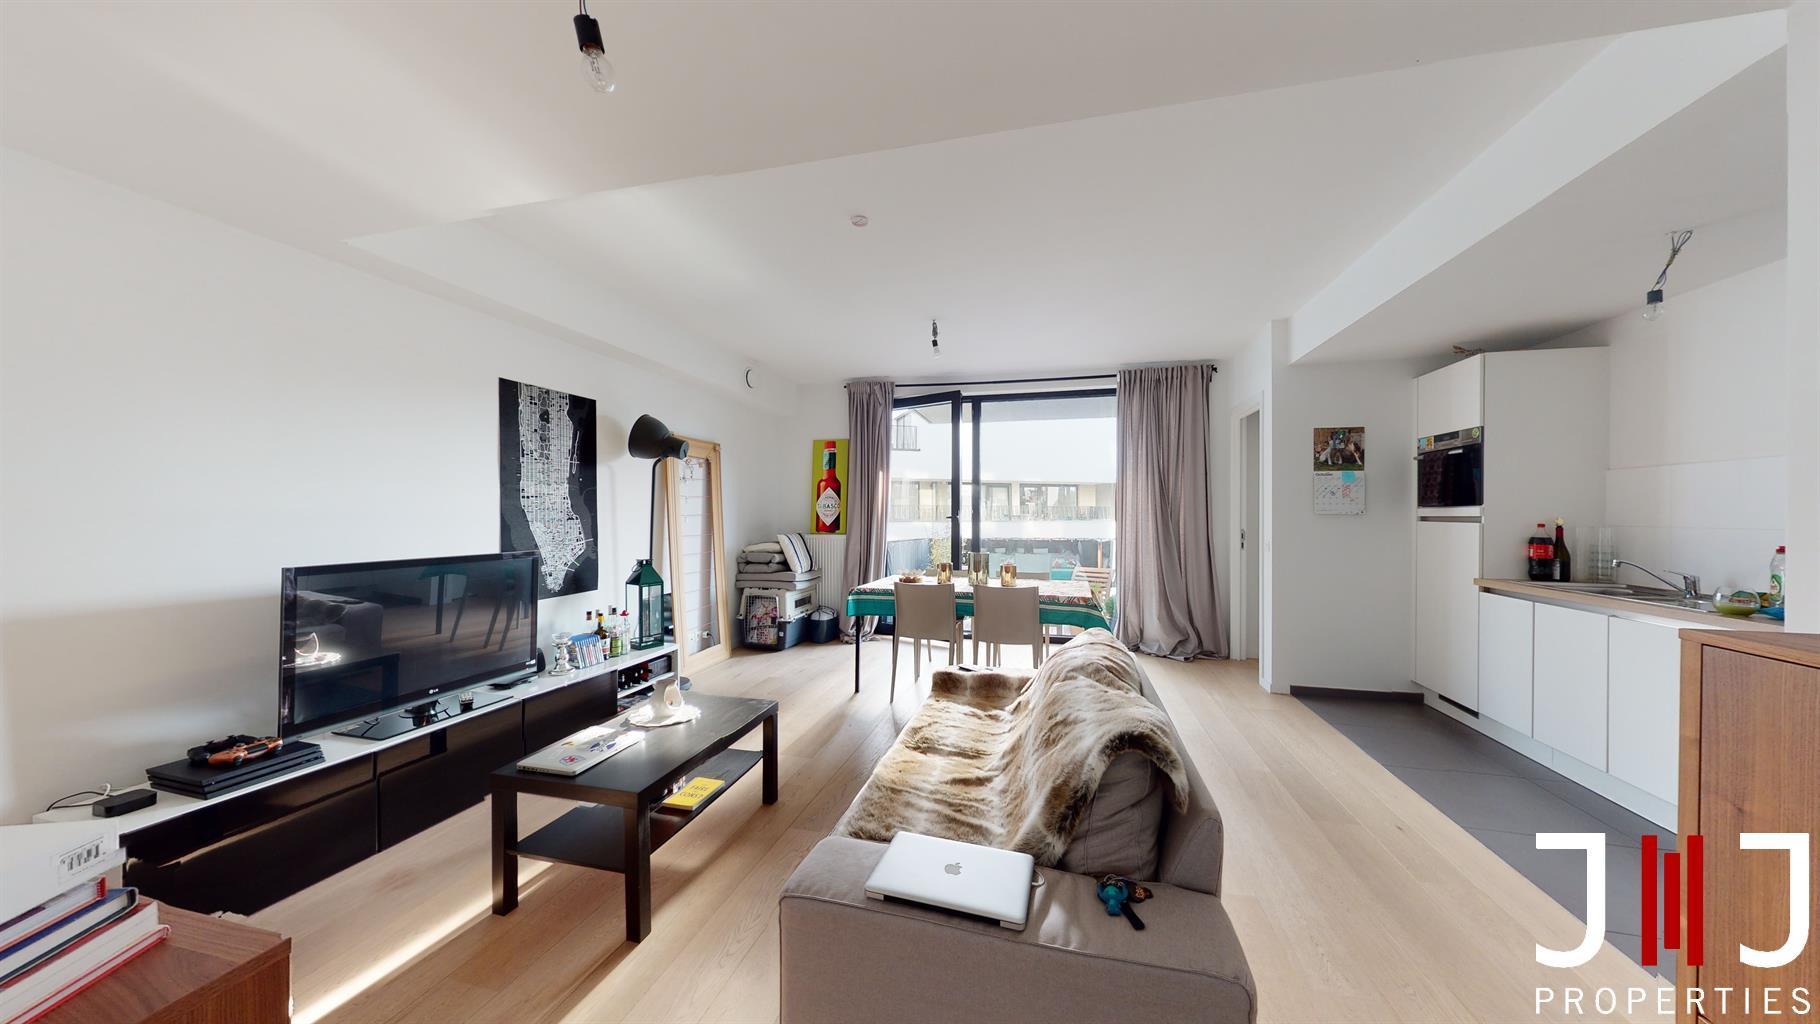 Appartement te koop in Brussel